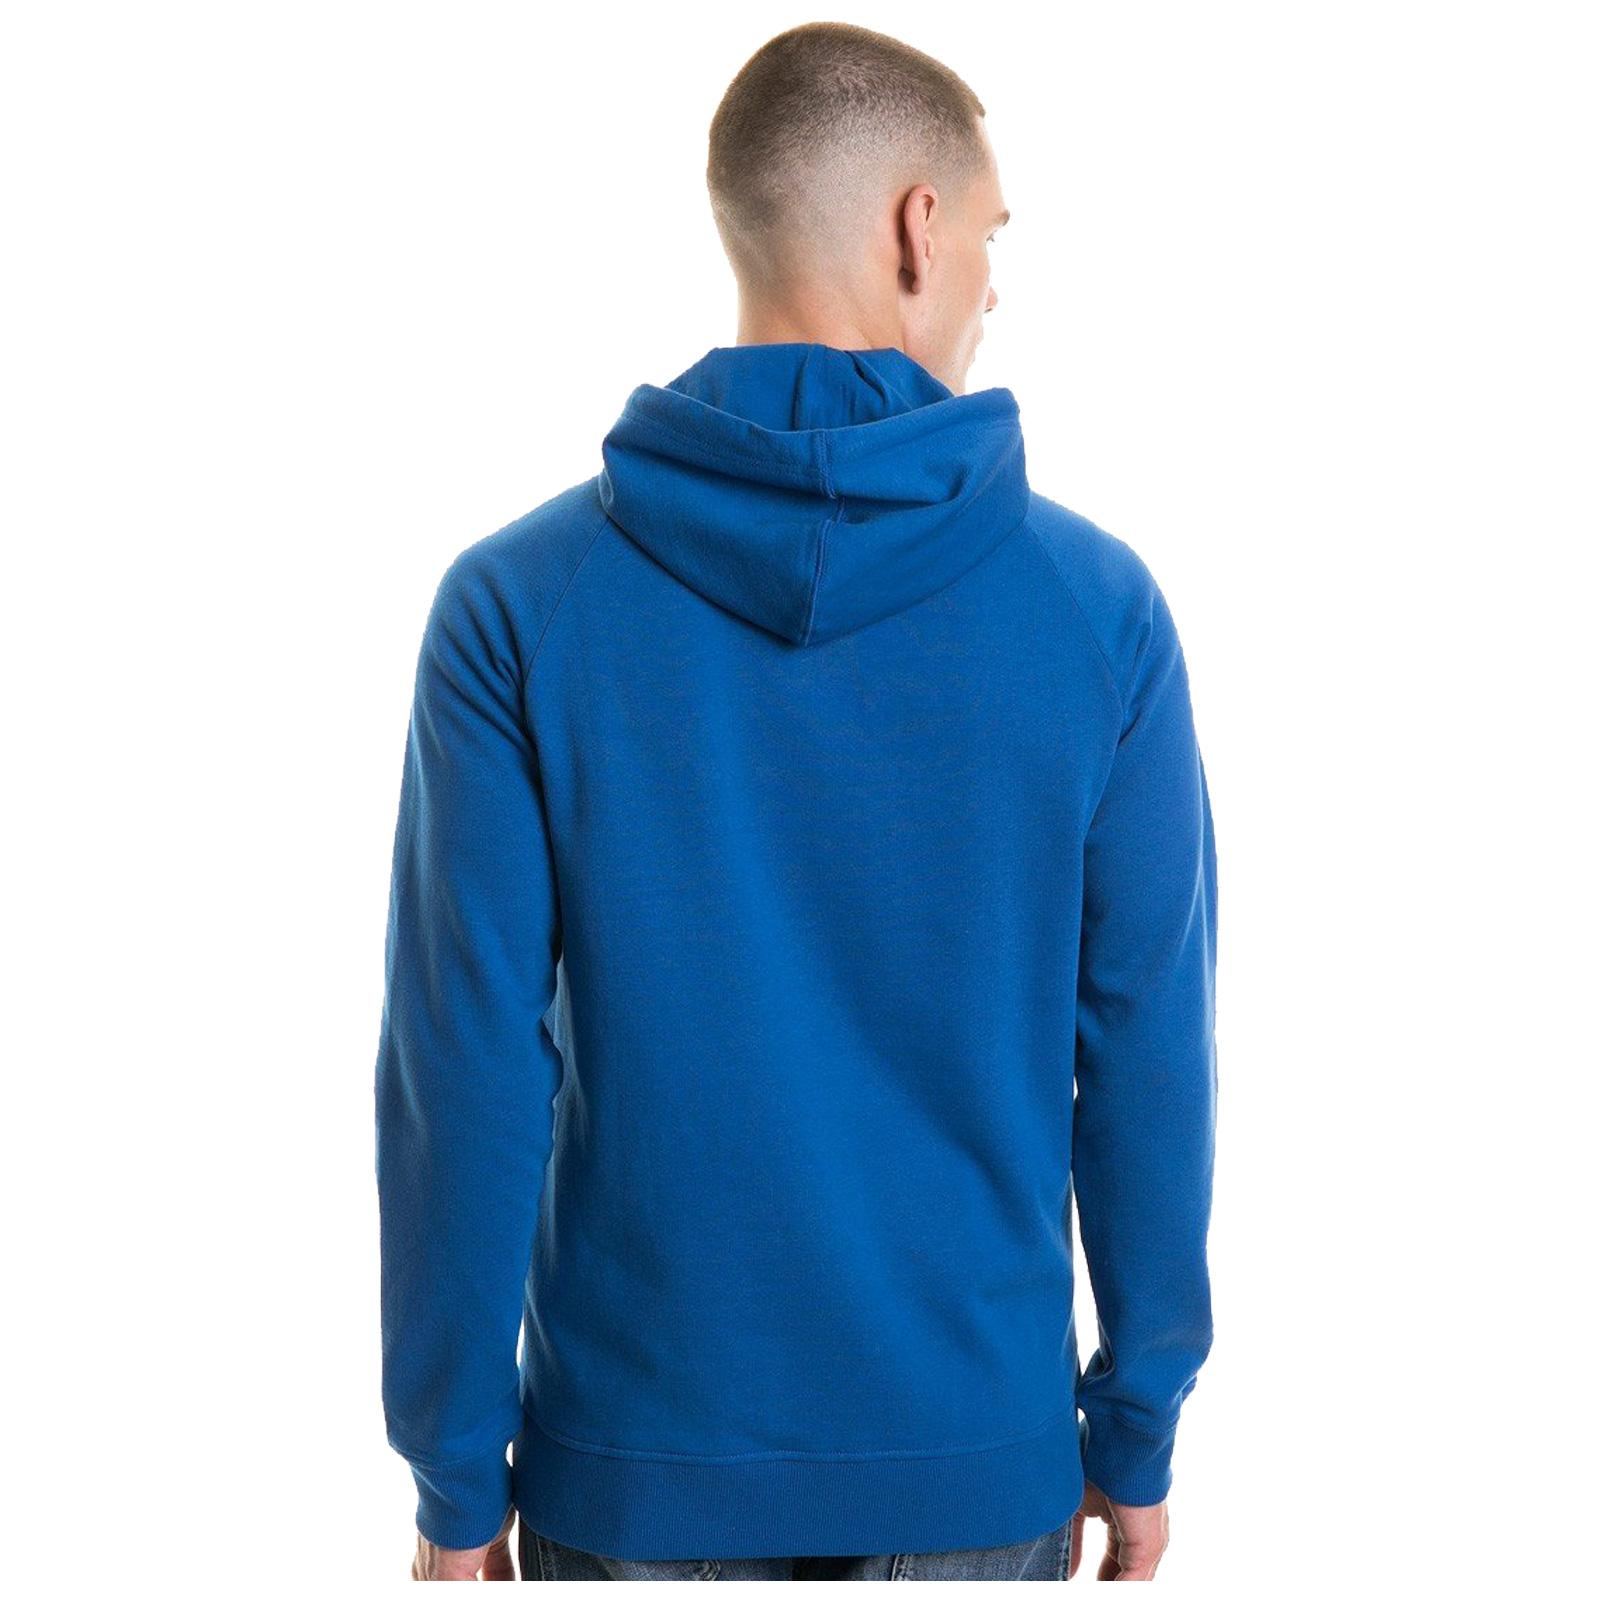 Big-Star-Mens-Hoodie-New-Cotton-Pullover-Full-Zip-Hooded-Casual-Sweatshirt thumbnail 9